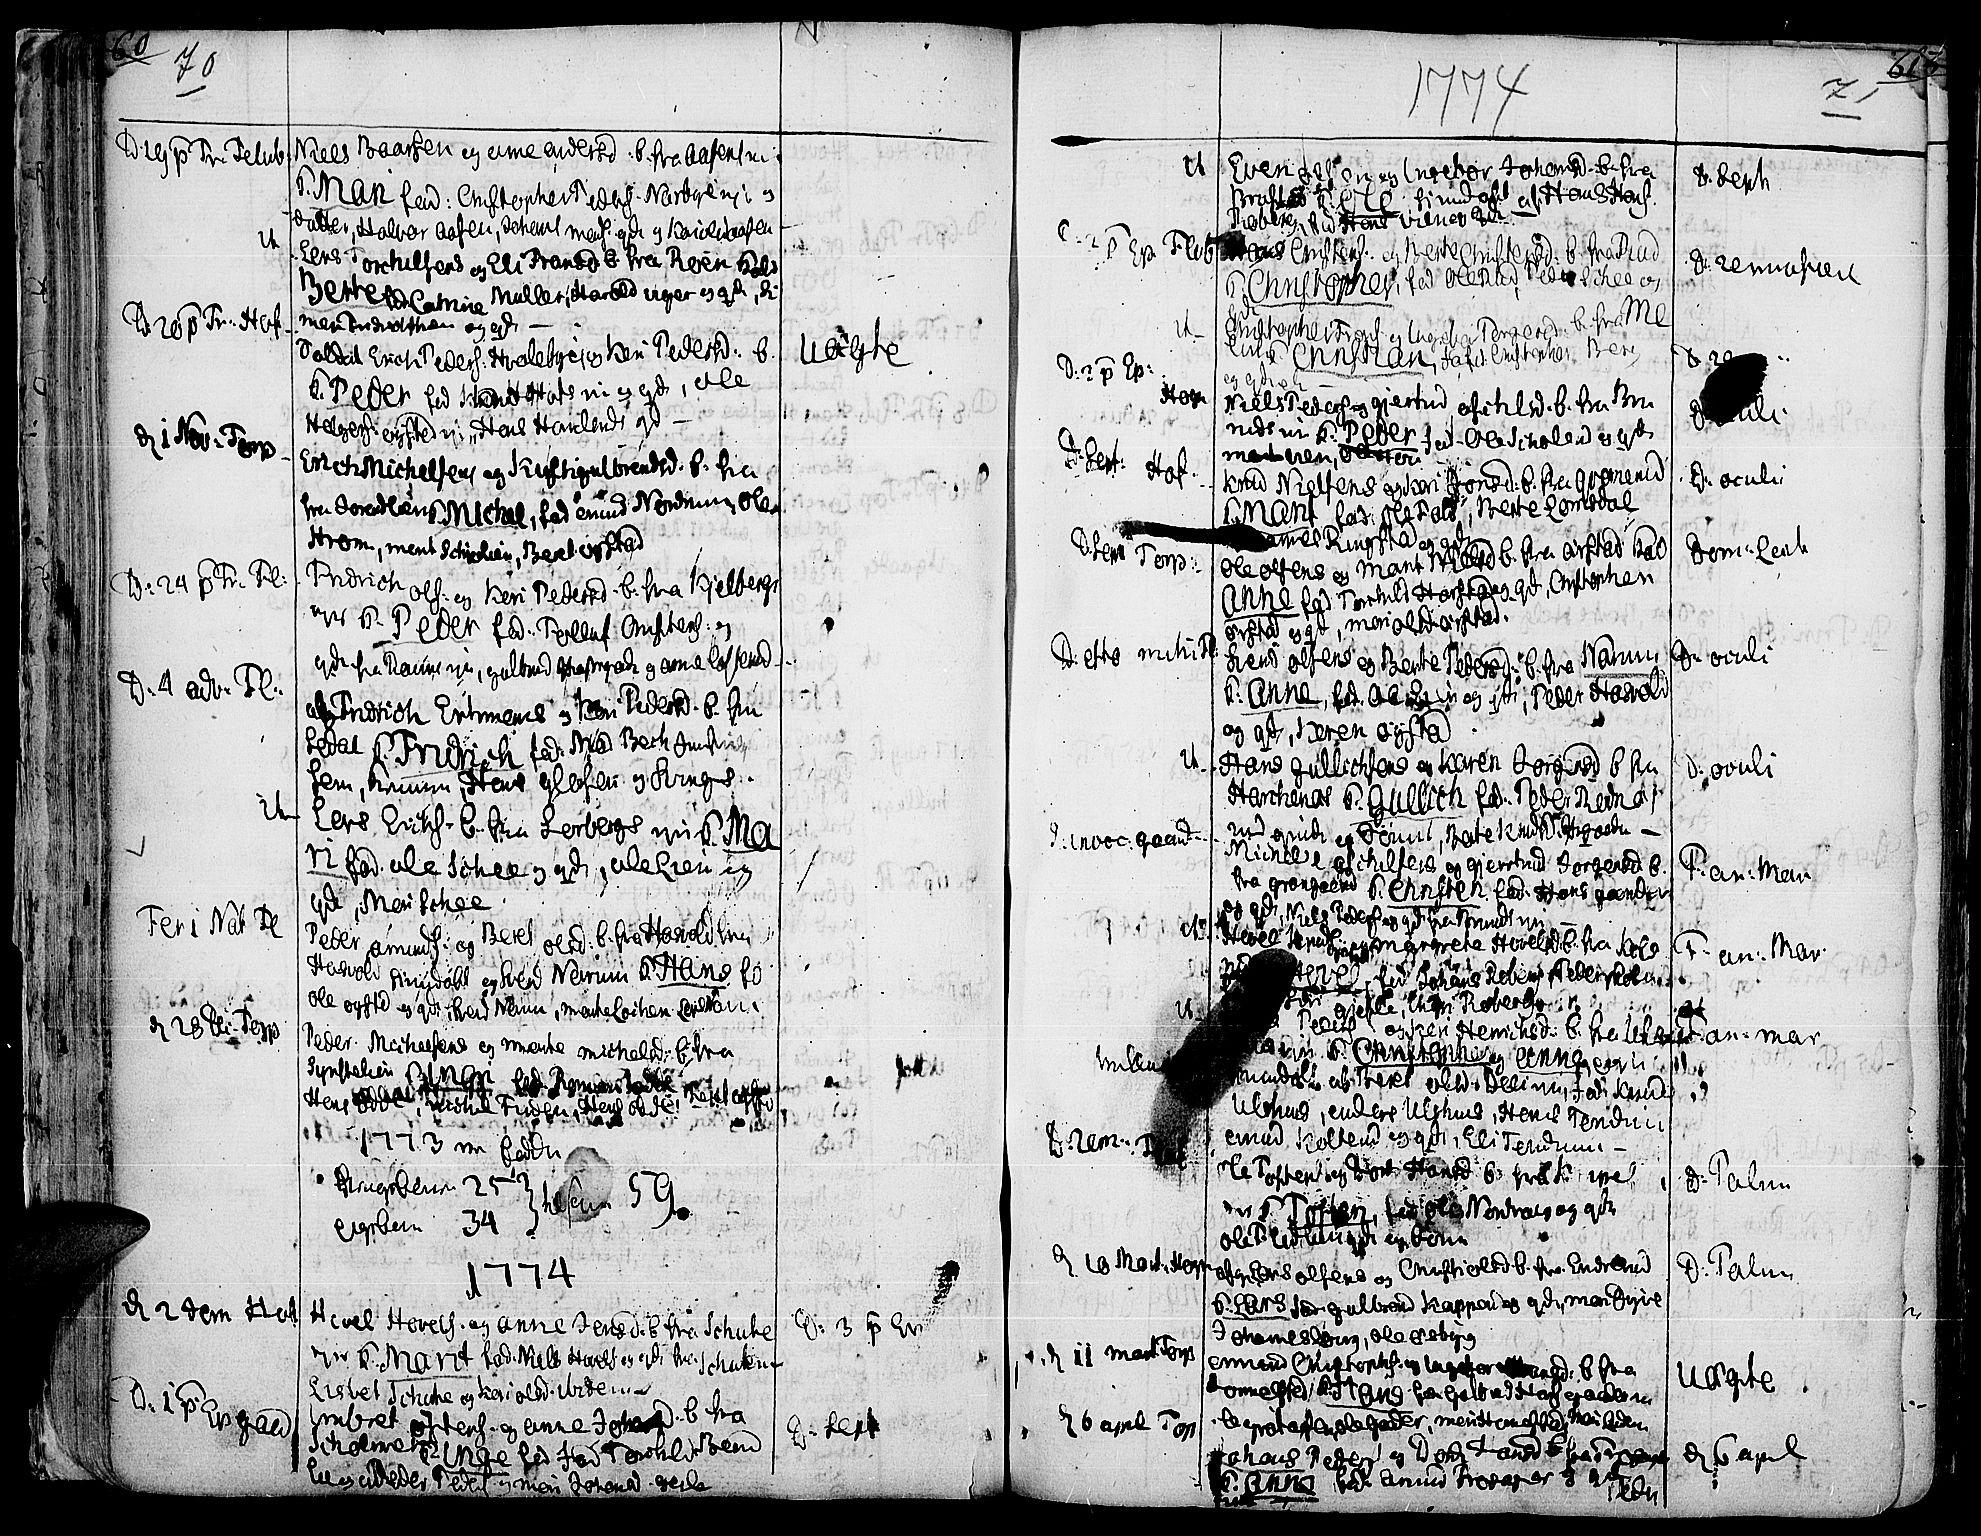 SAH, Land prestekontor, Ministerialbok nr. 5, 1765-1784, s. 70-71